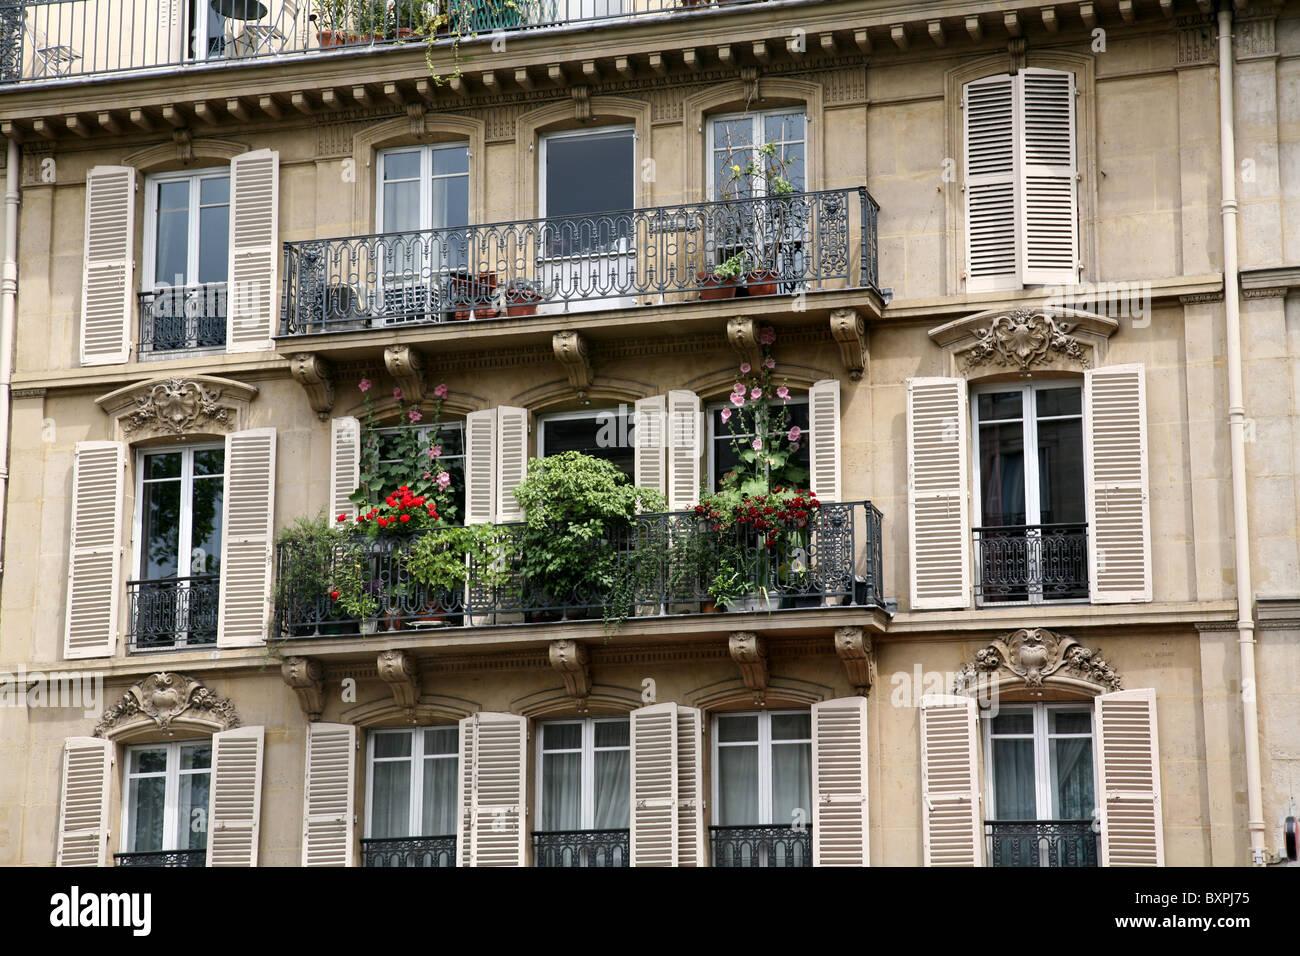 Paris Apartment Building Balcony With Flowers